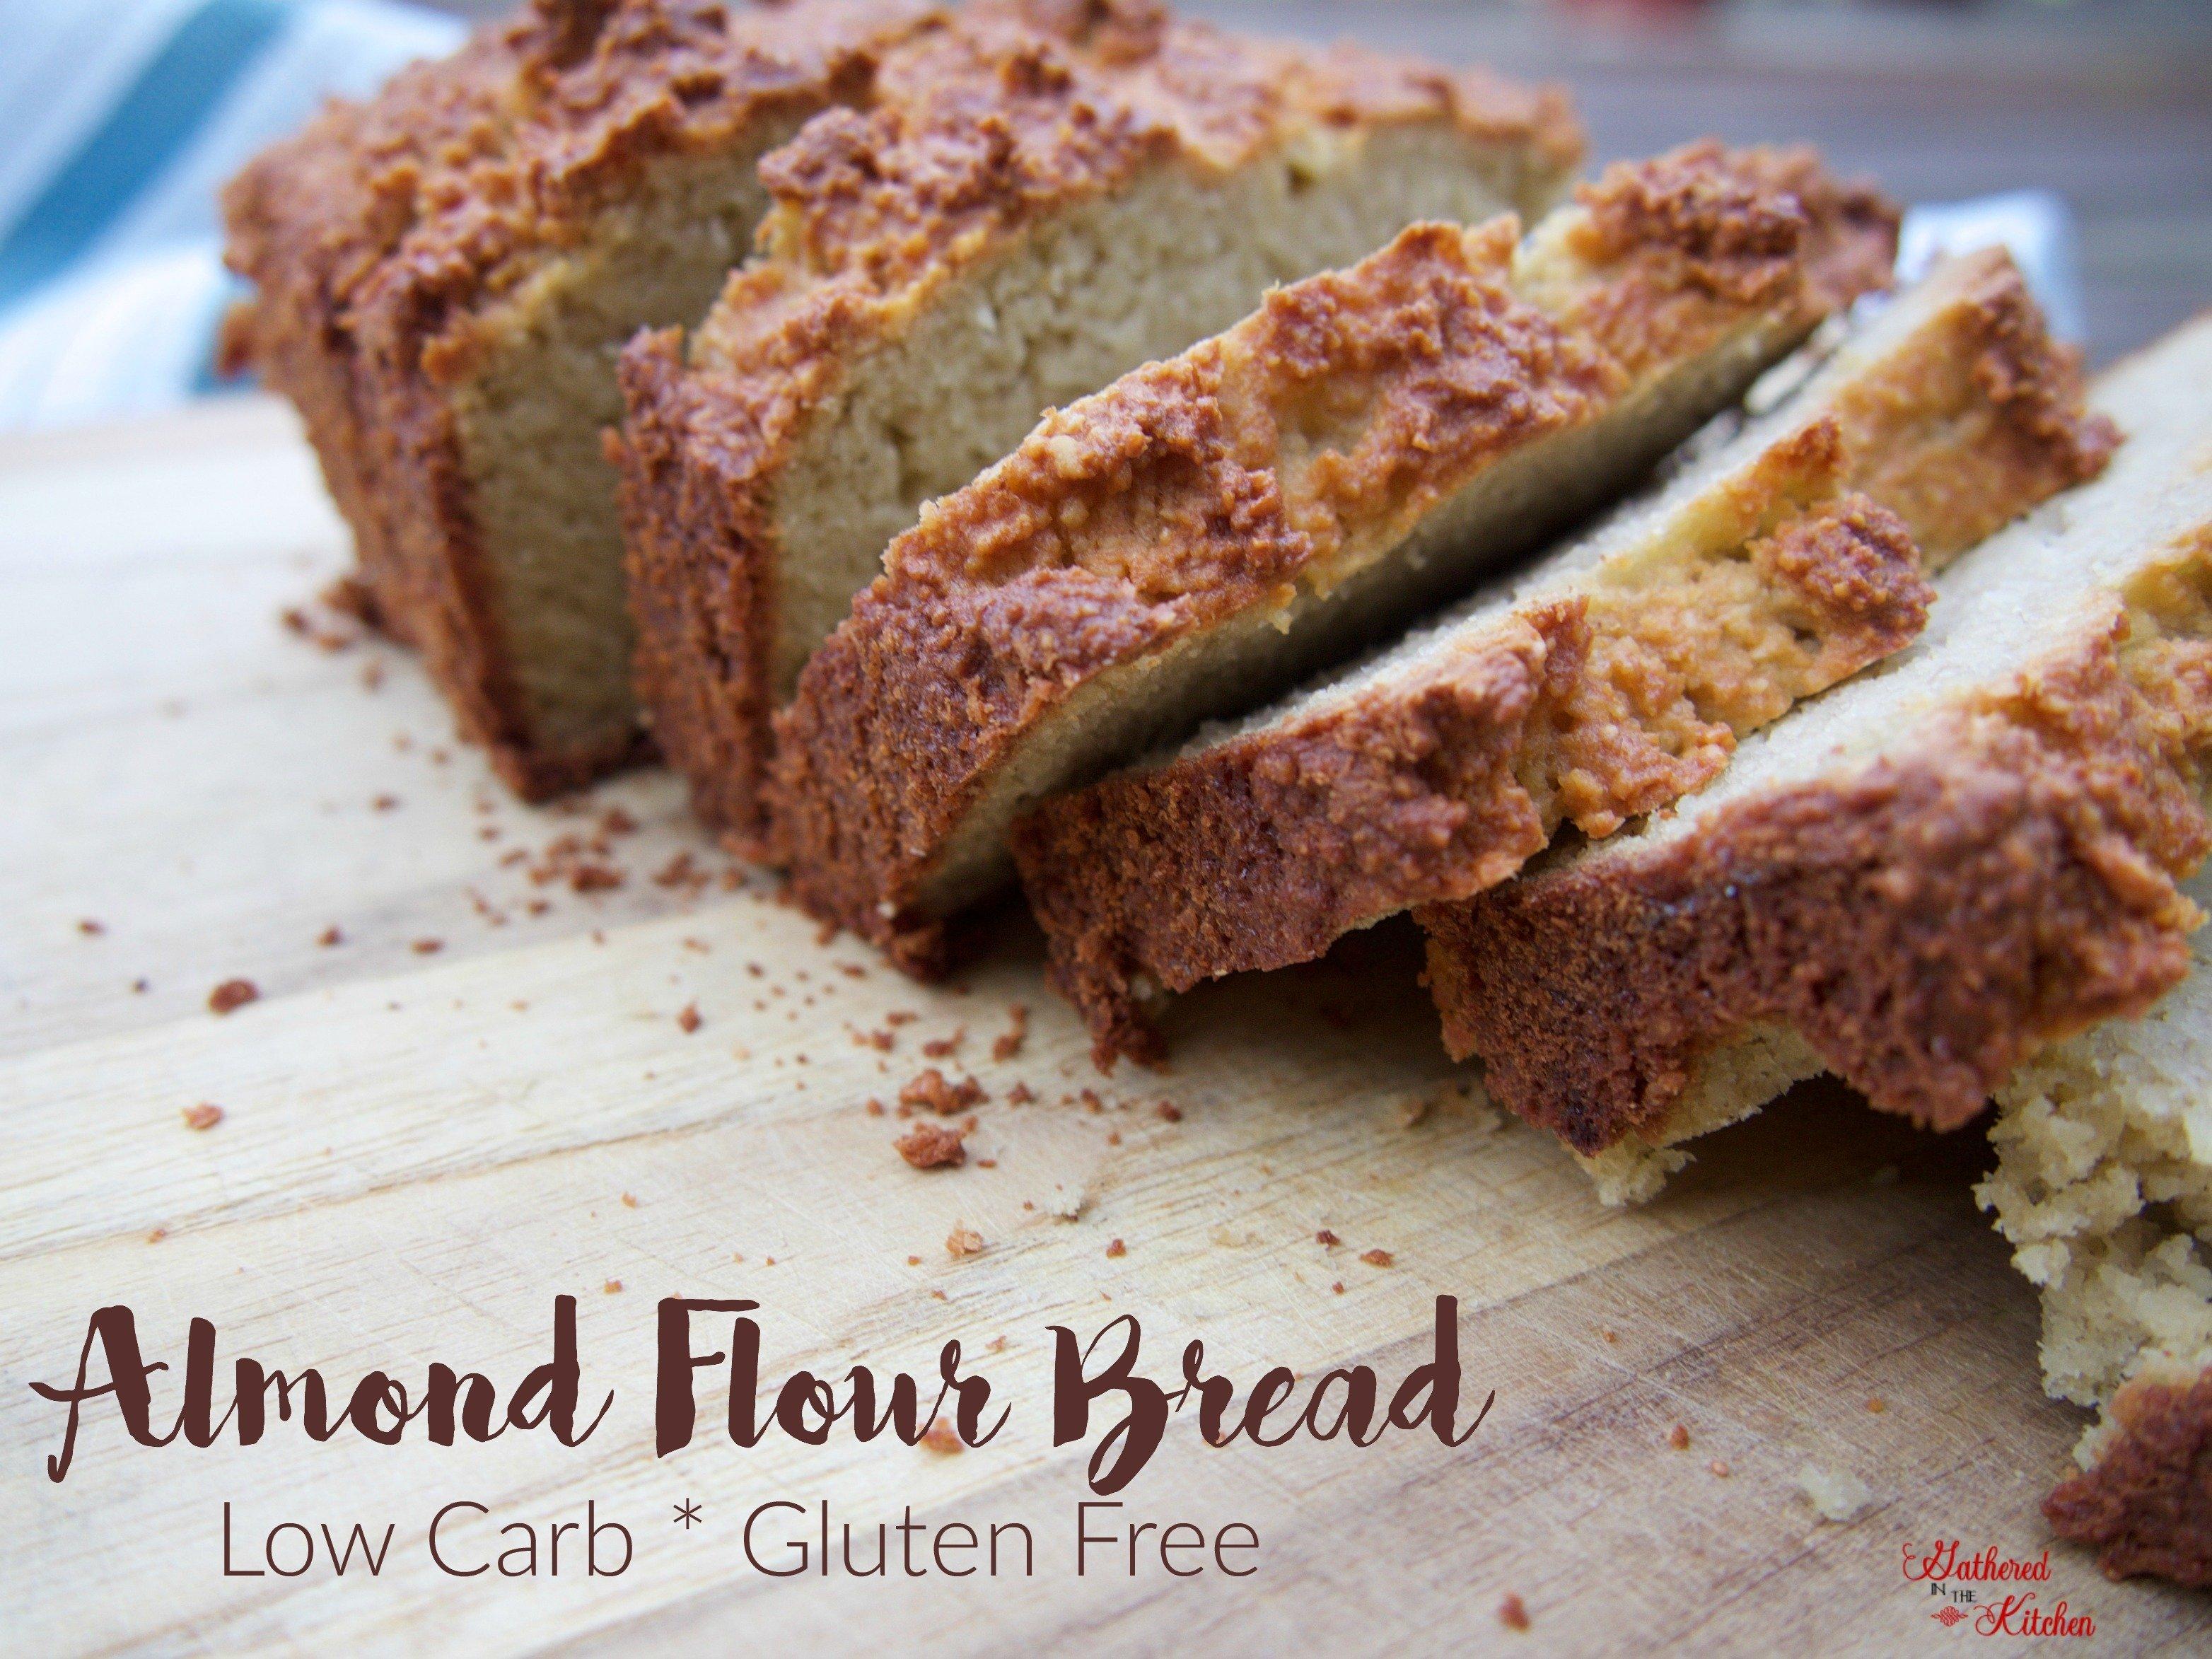 Almond Flour Bread: Low Carb & Gluten Free